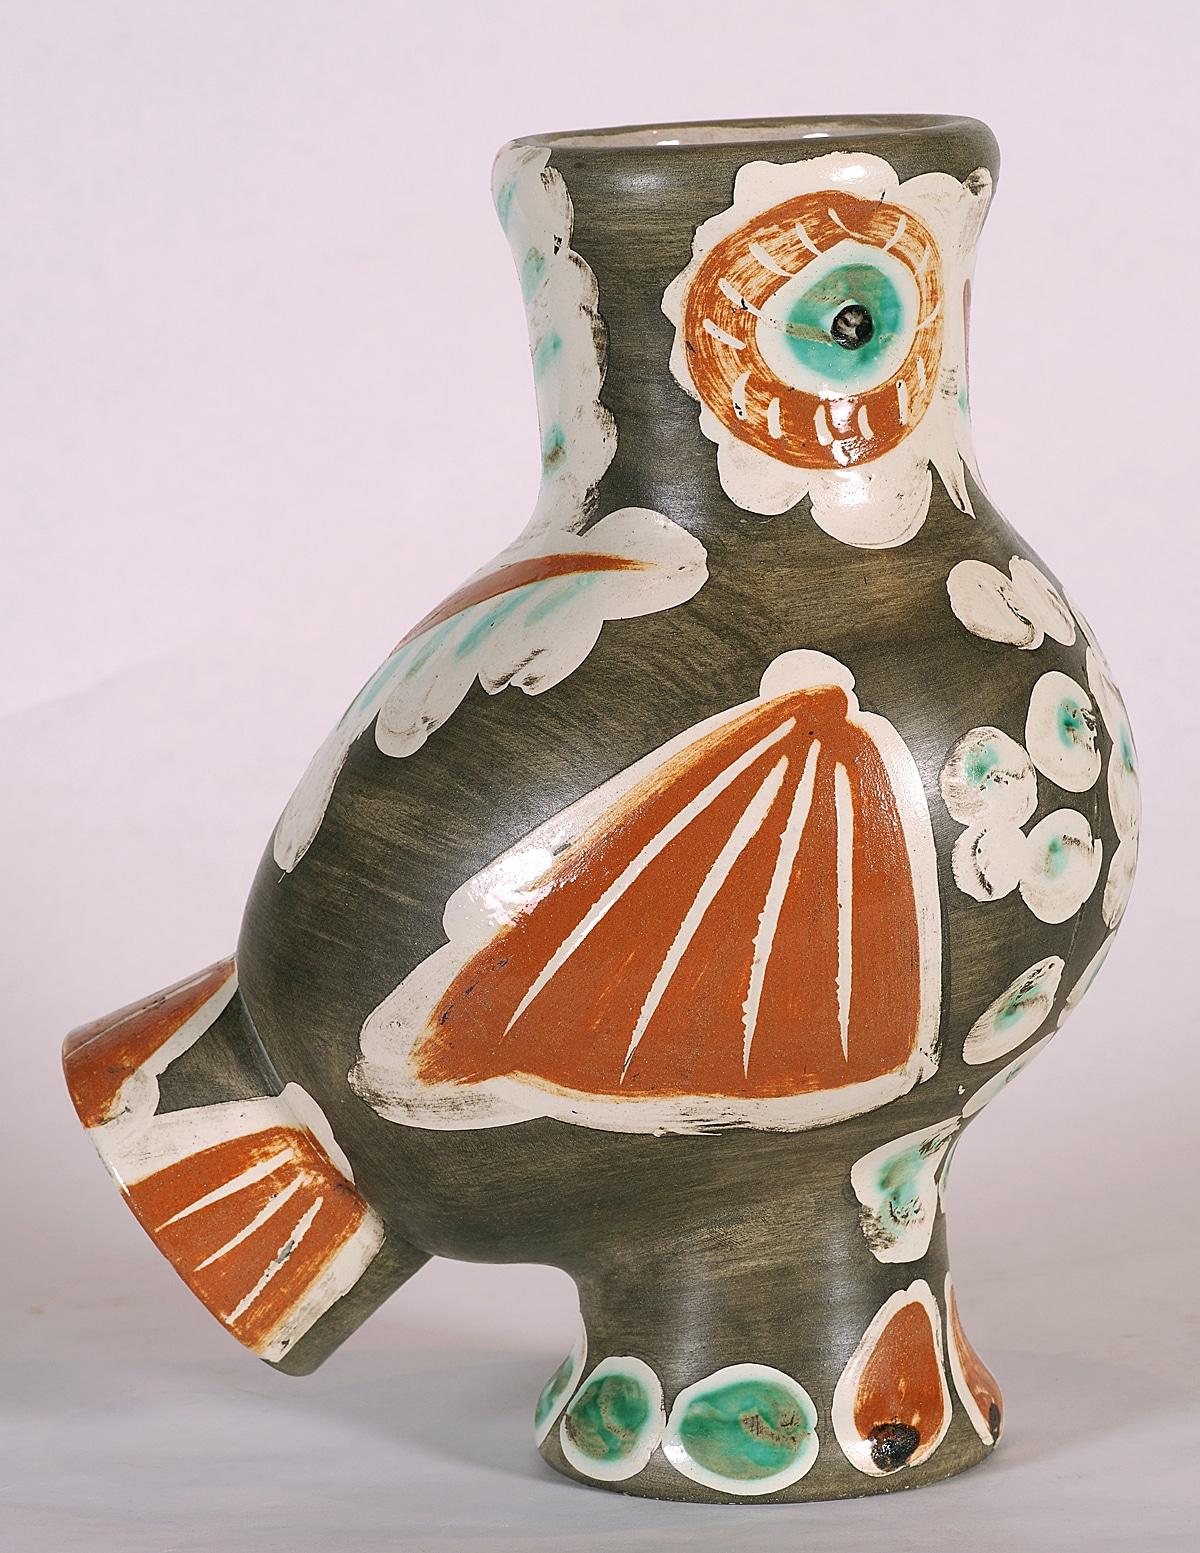 """Chouette"" (Wood Owl; 1968), Pablo Picasso, Picasso Ceramics"